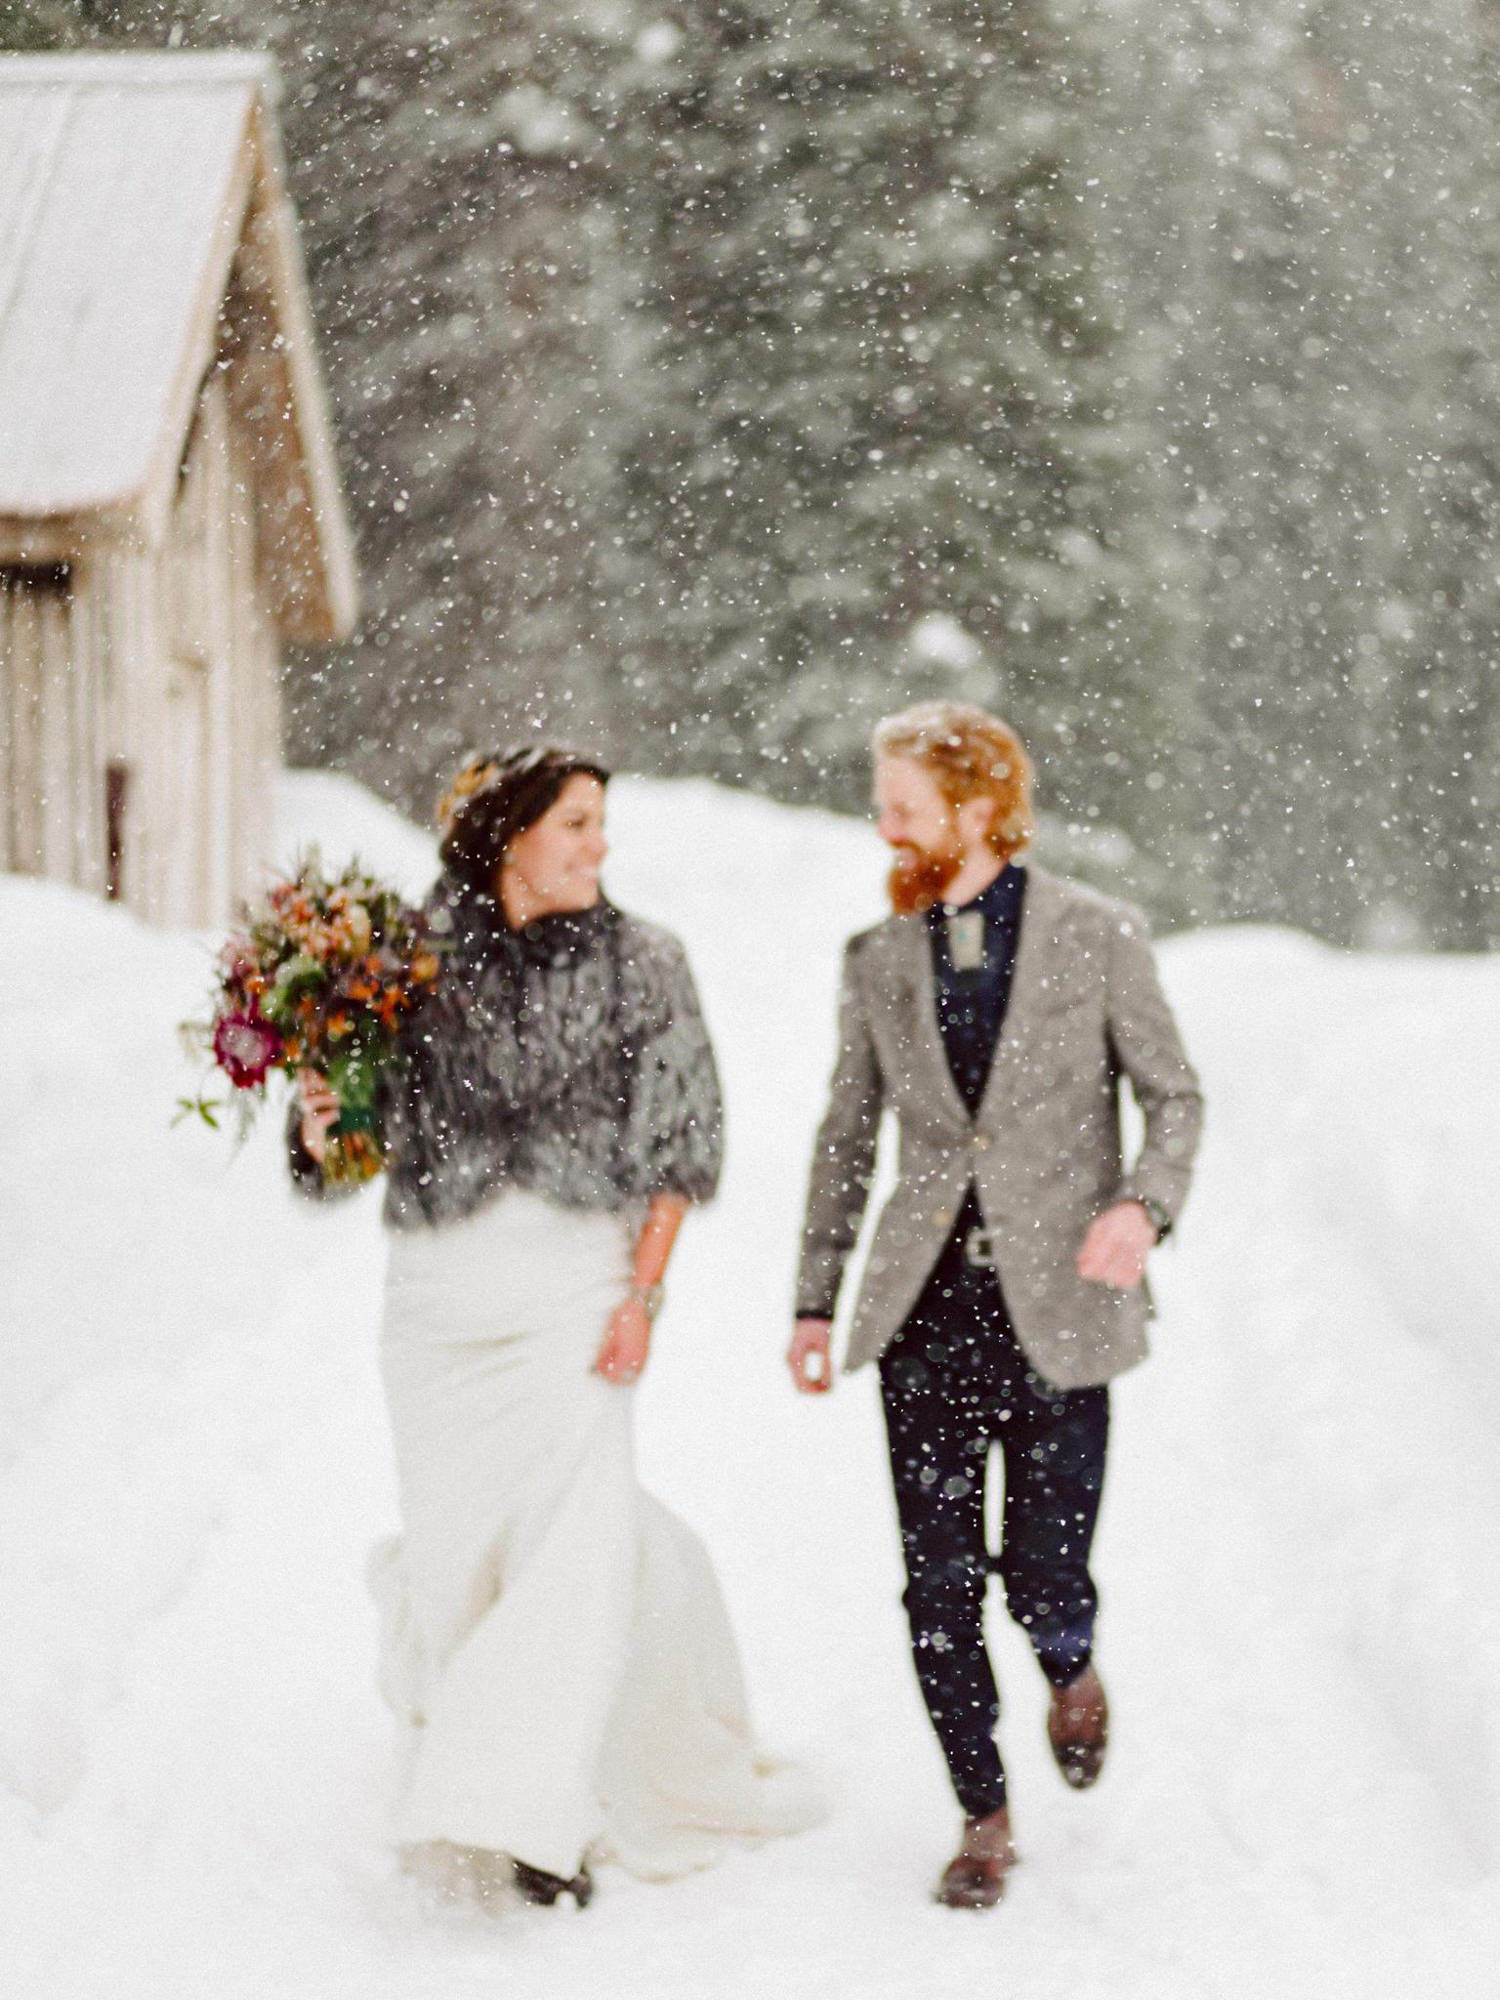 Couple running in snow - Photo by Benj Haisch - Seattle